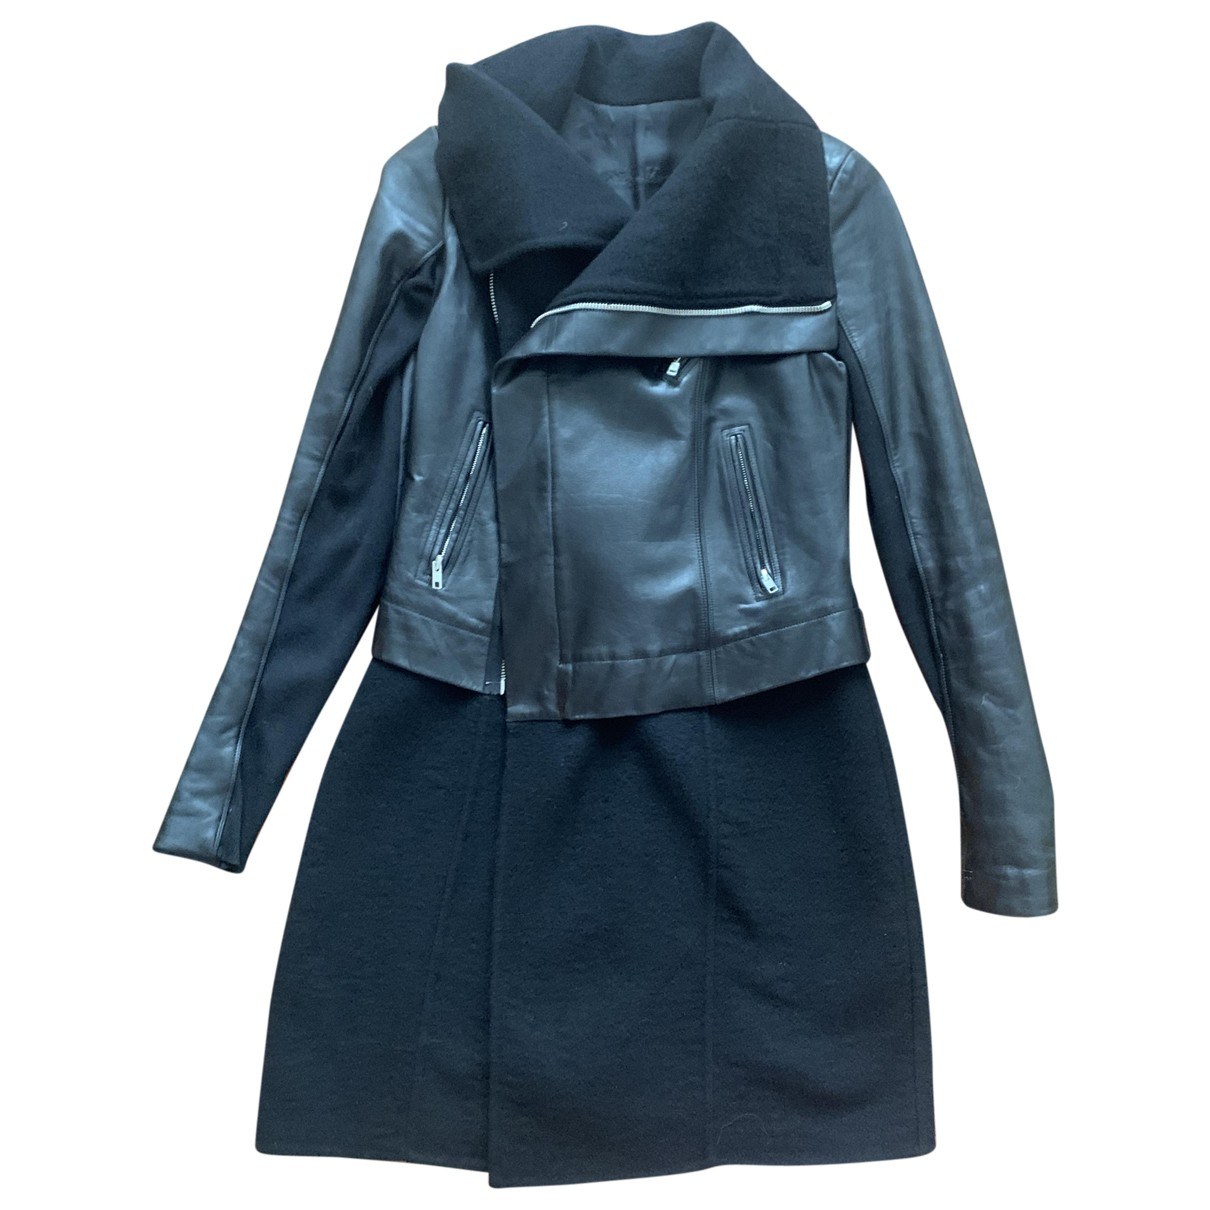 Rick Owens N Black Leather Coat for Women